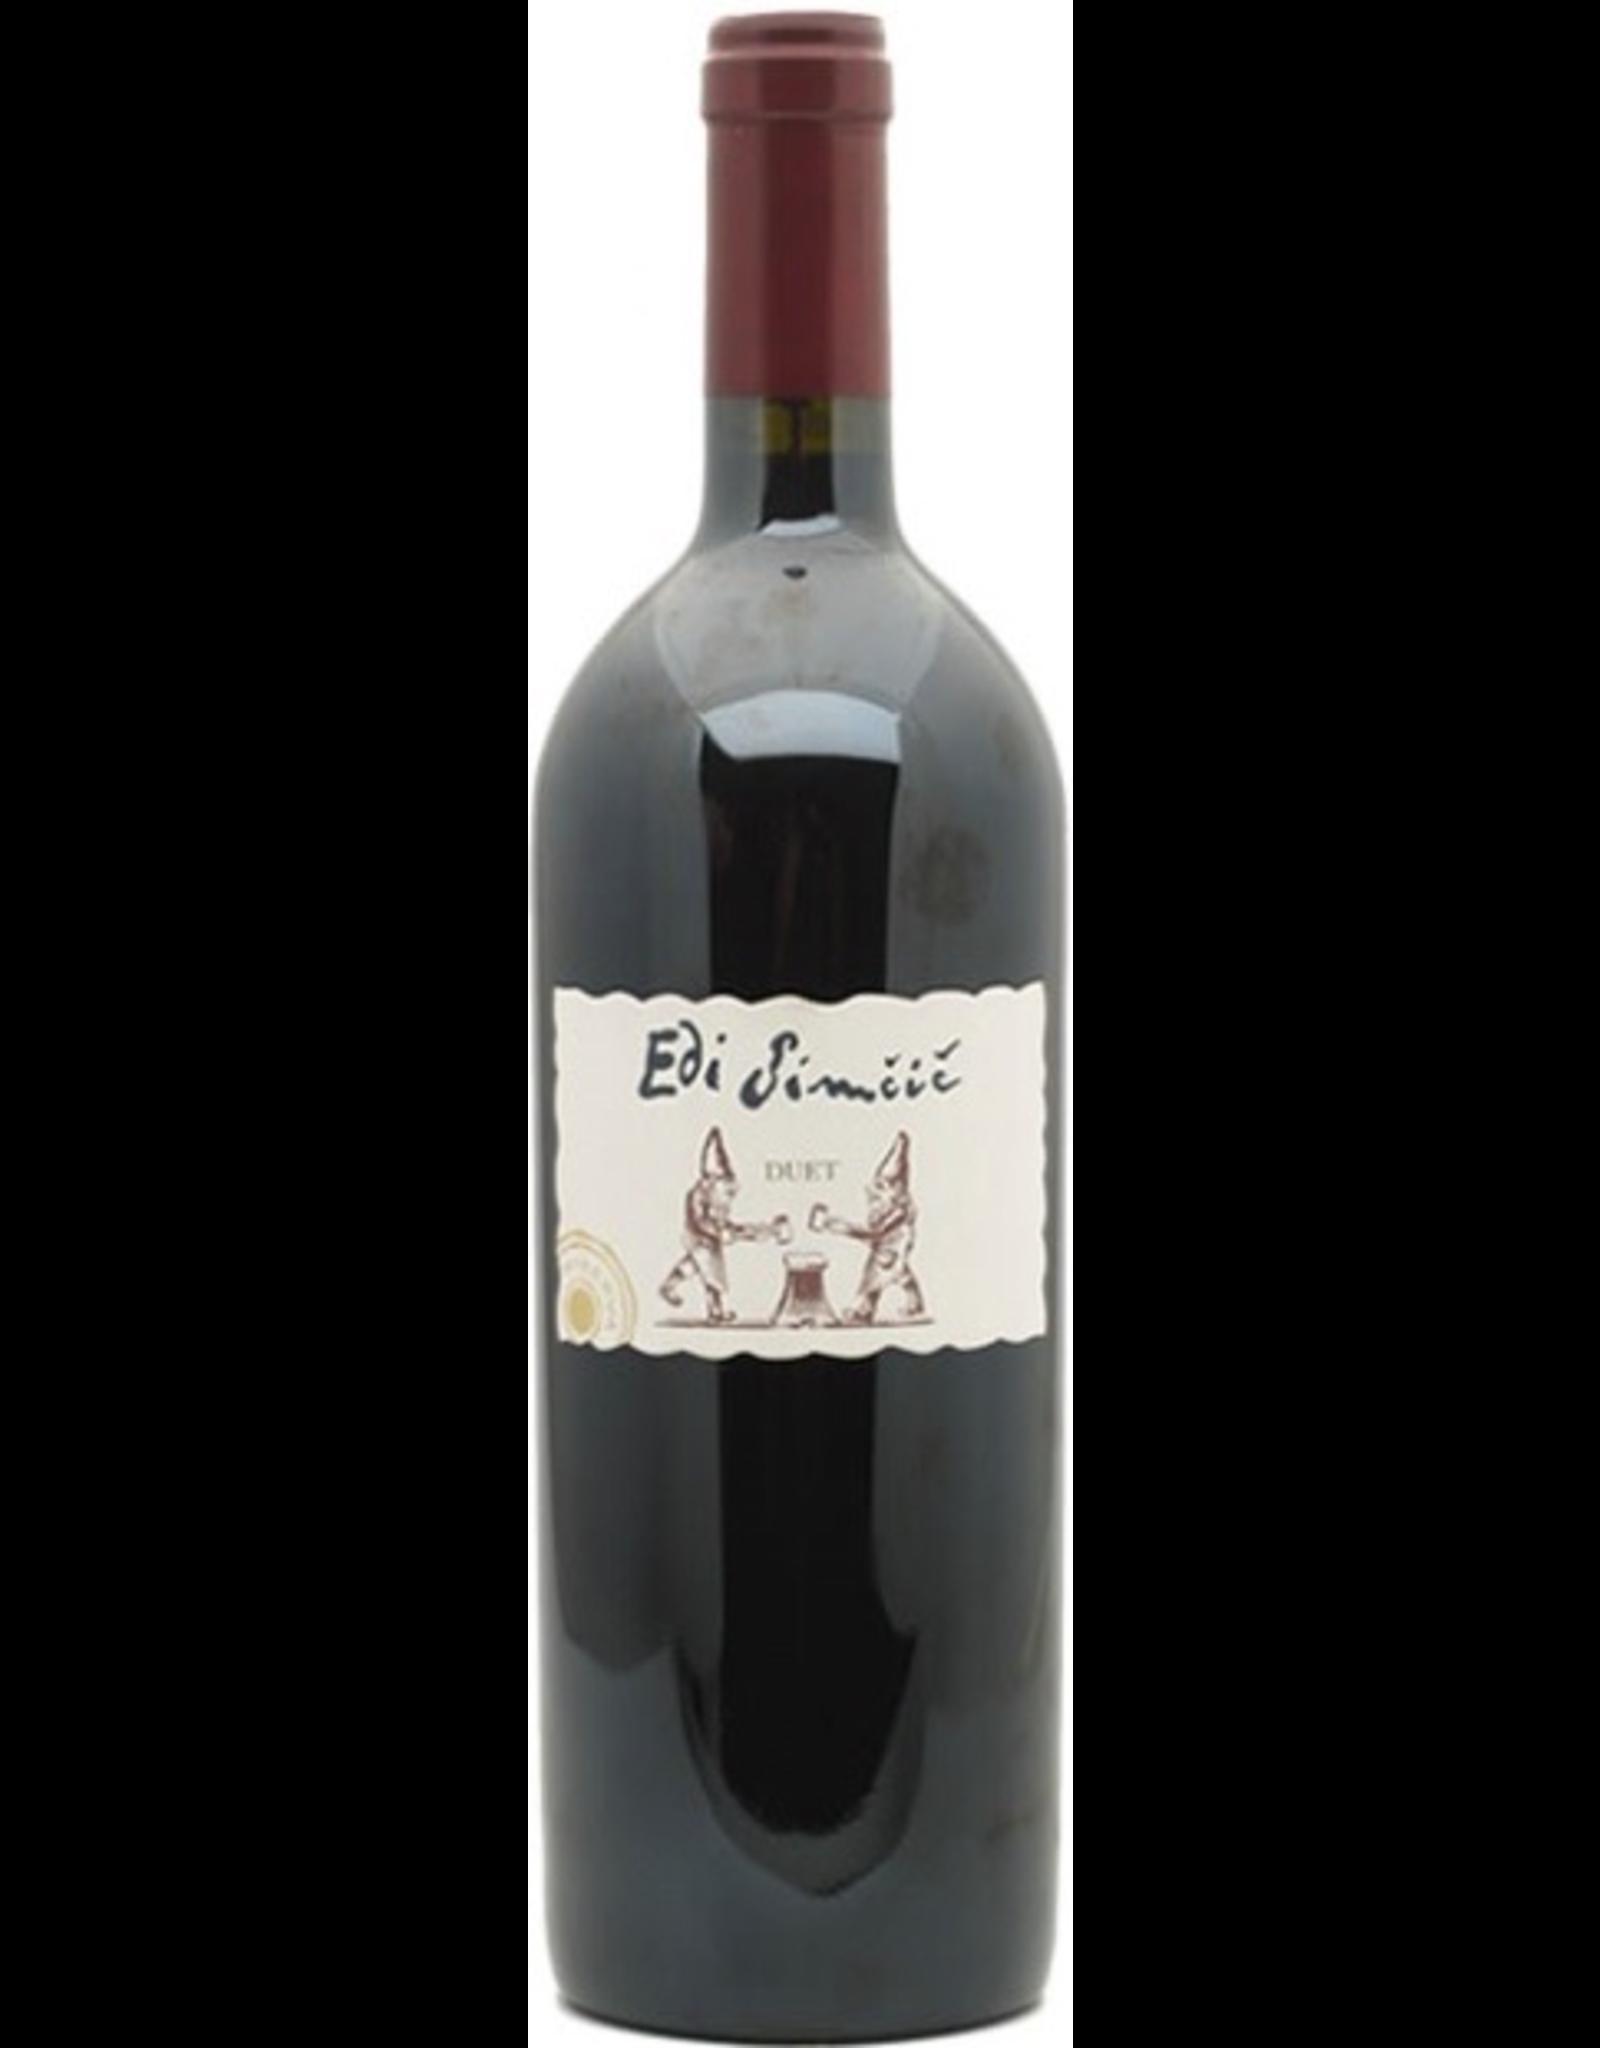 Red Wine 2016, Edi Simcic DUET, Red Bordeaux Blend, Goriska Brda, Slovenia, 13.5% Alc, CT89.7, WS91, TW91